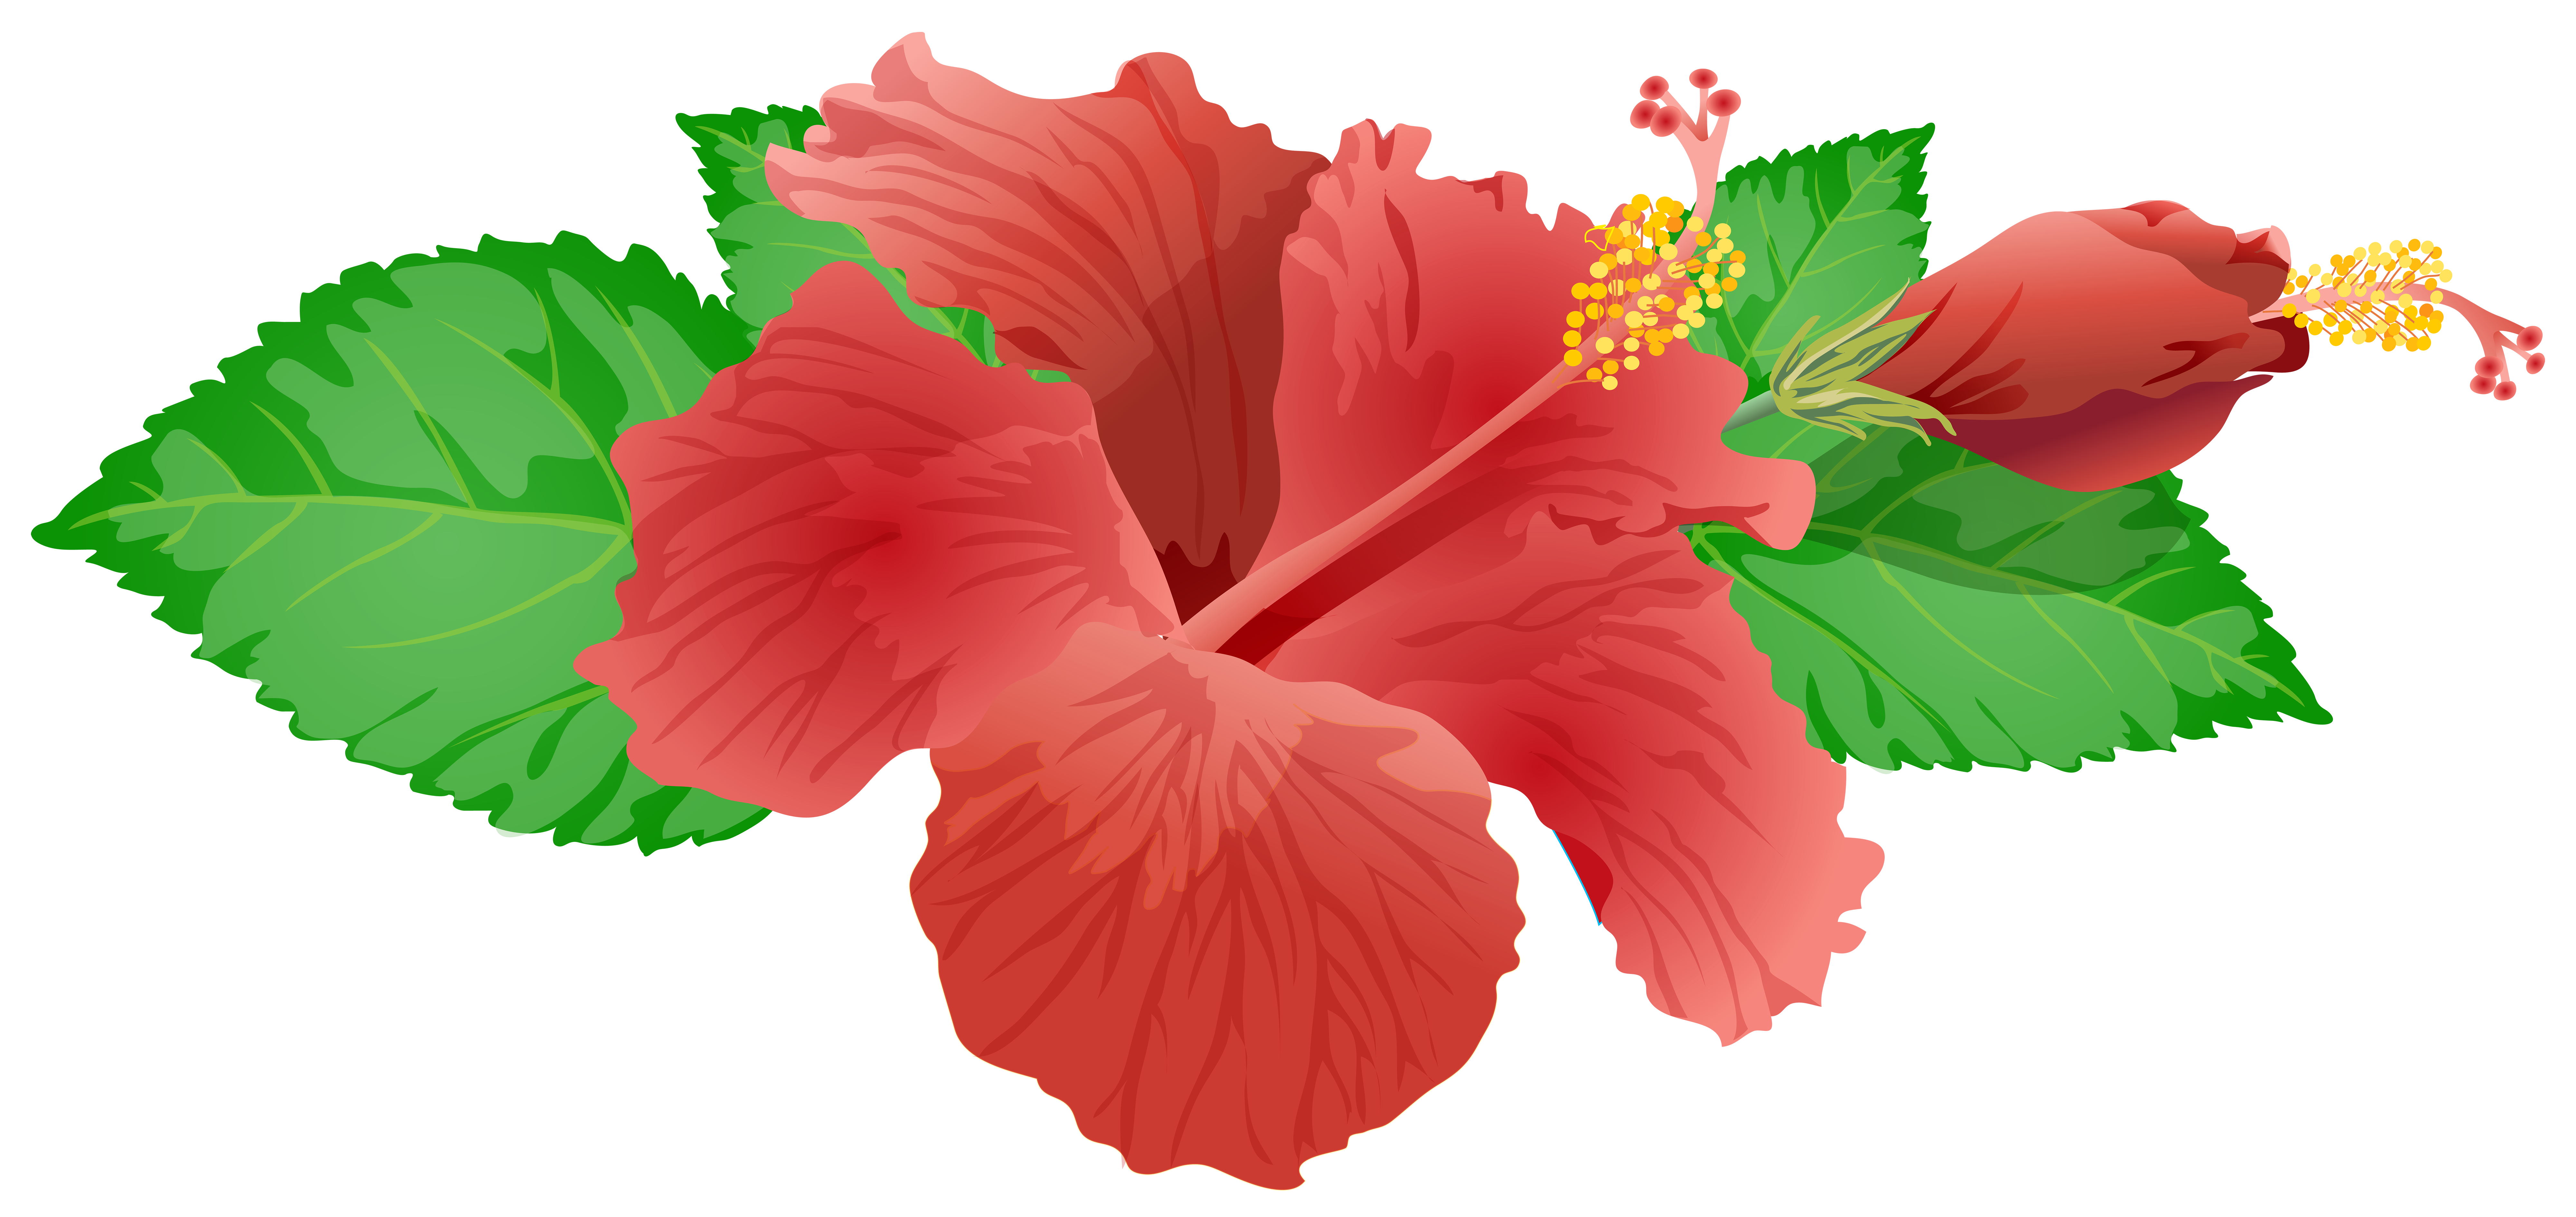 Clip art image best. Red flower png